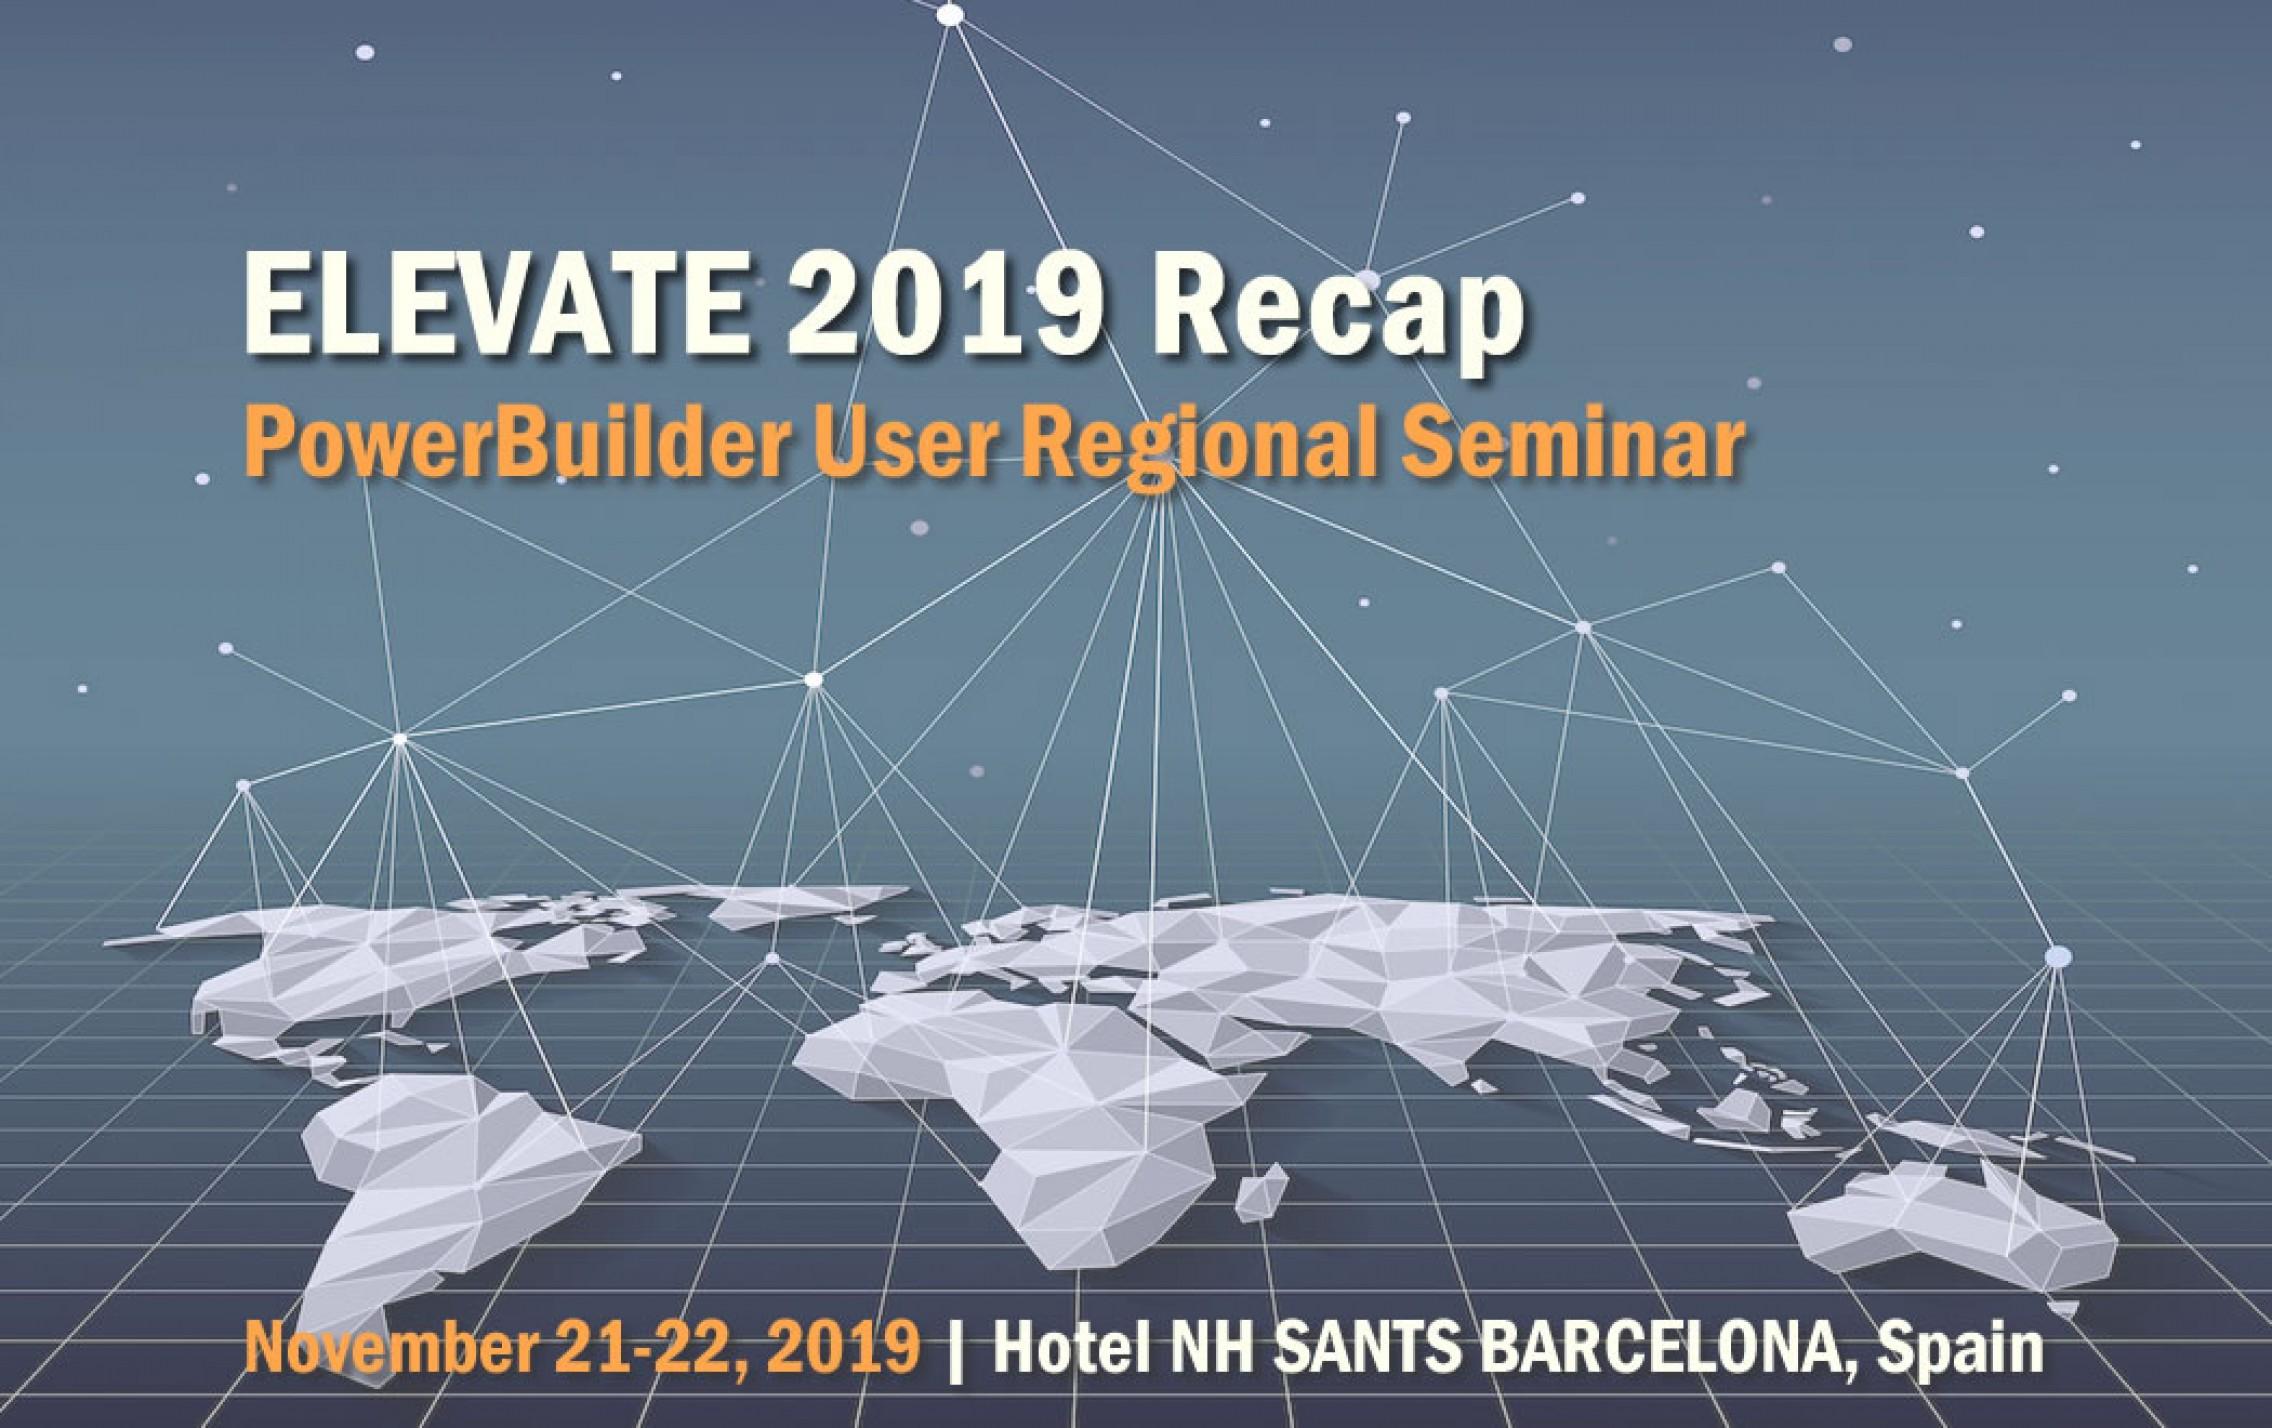 Elevate 2019 Recap Seminar - Softpi